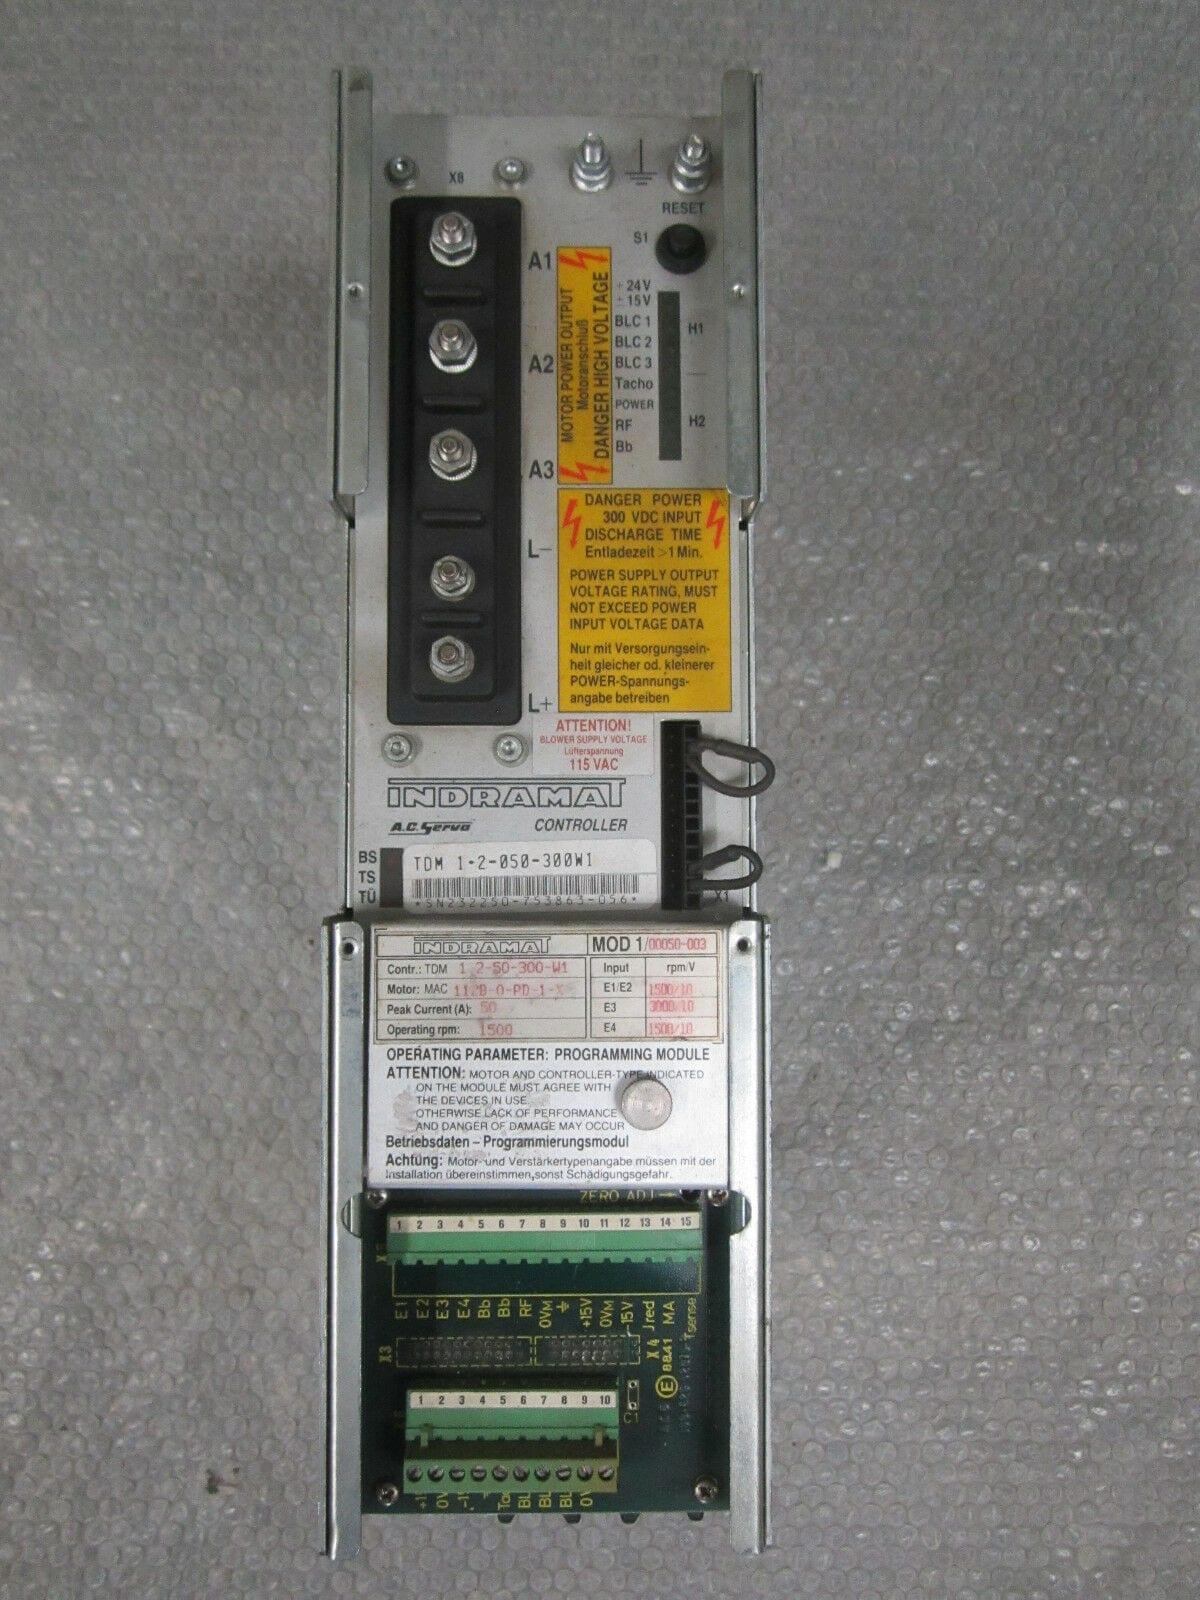 Indramat TDM 1.2-050-300W1